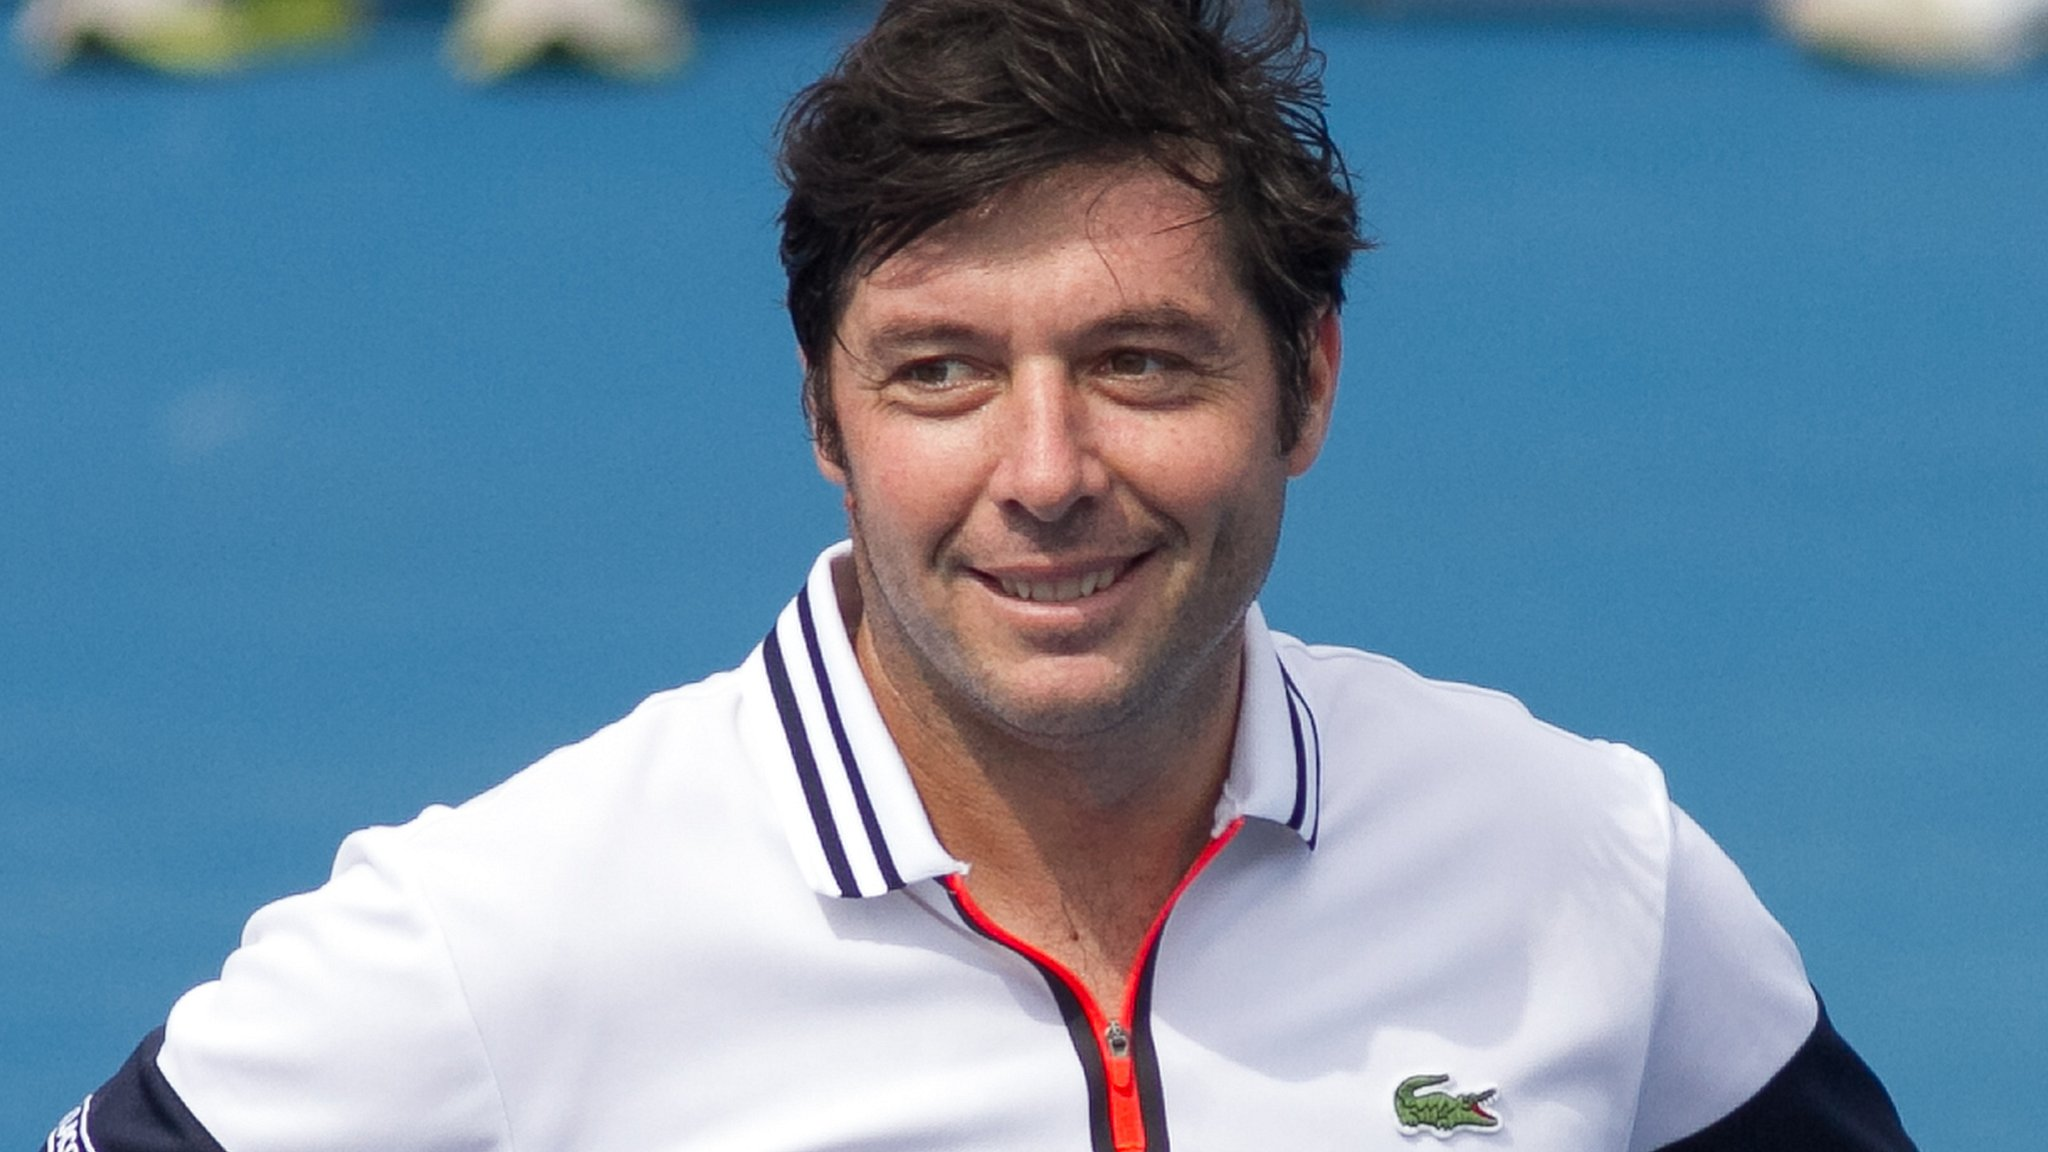 Davis Cup: Sebastien Grosjean named France captain for next two seasons